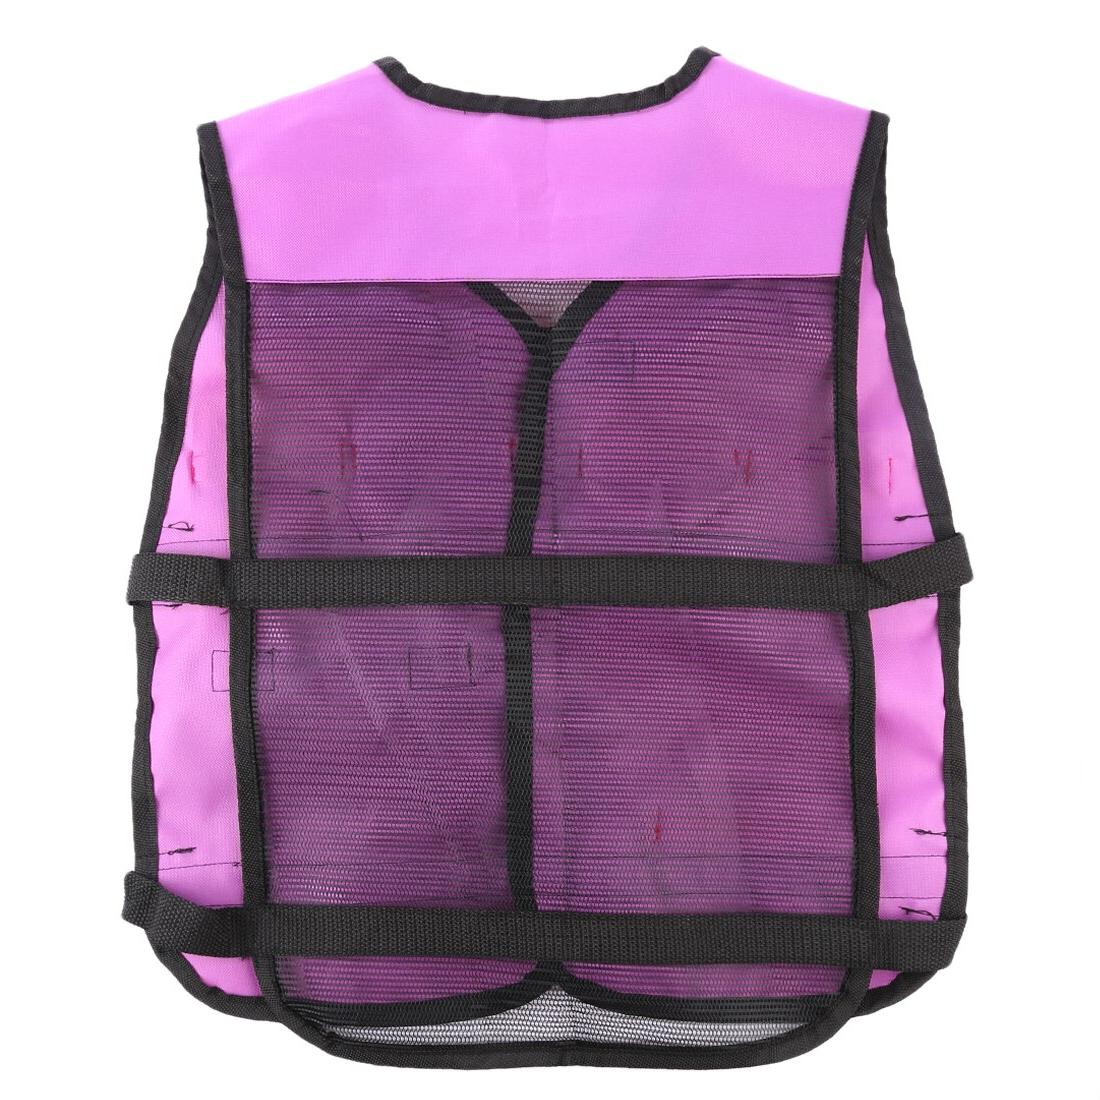 FOR N-STRIKE Storage Tactical Equipment For <font><b>Nerf</b></font> Strap Women